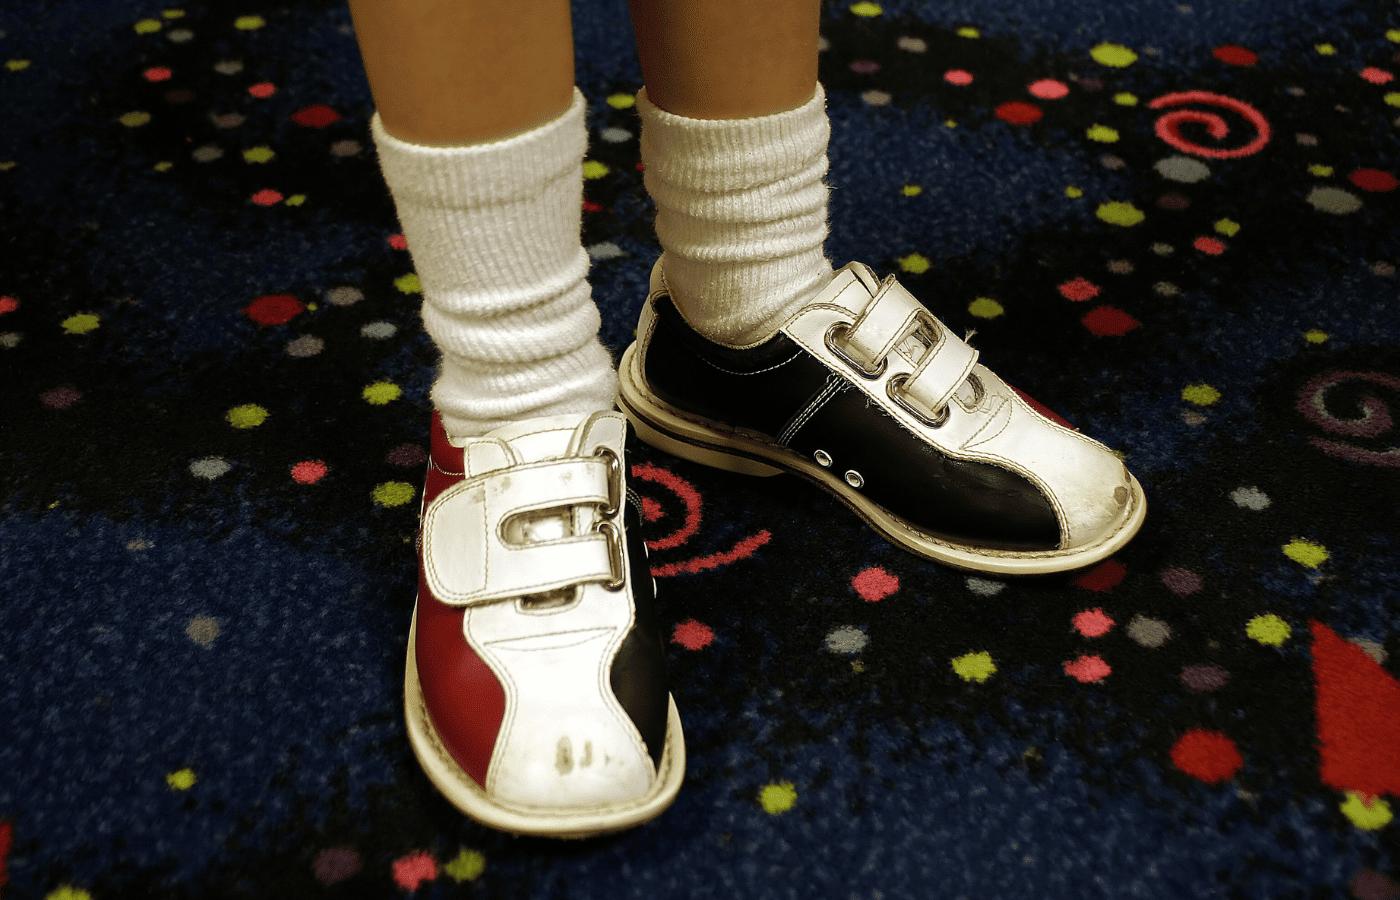 do bowling alleys sell socks